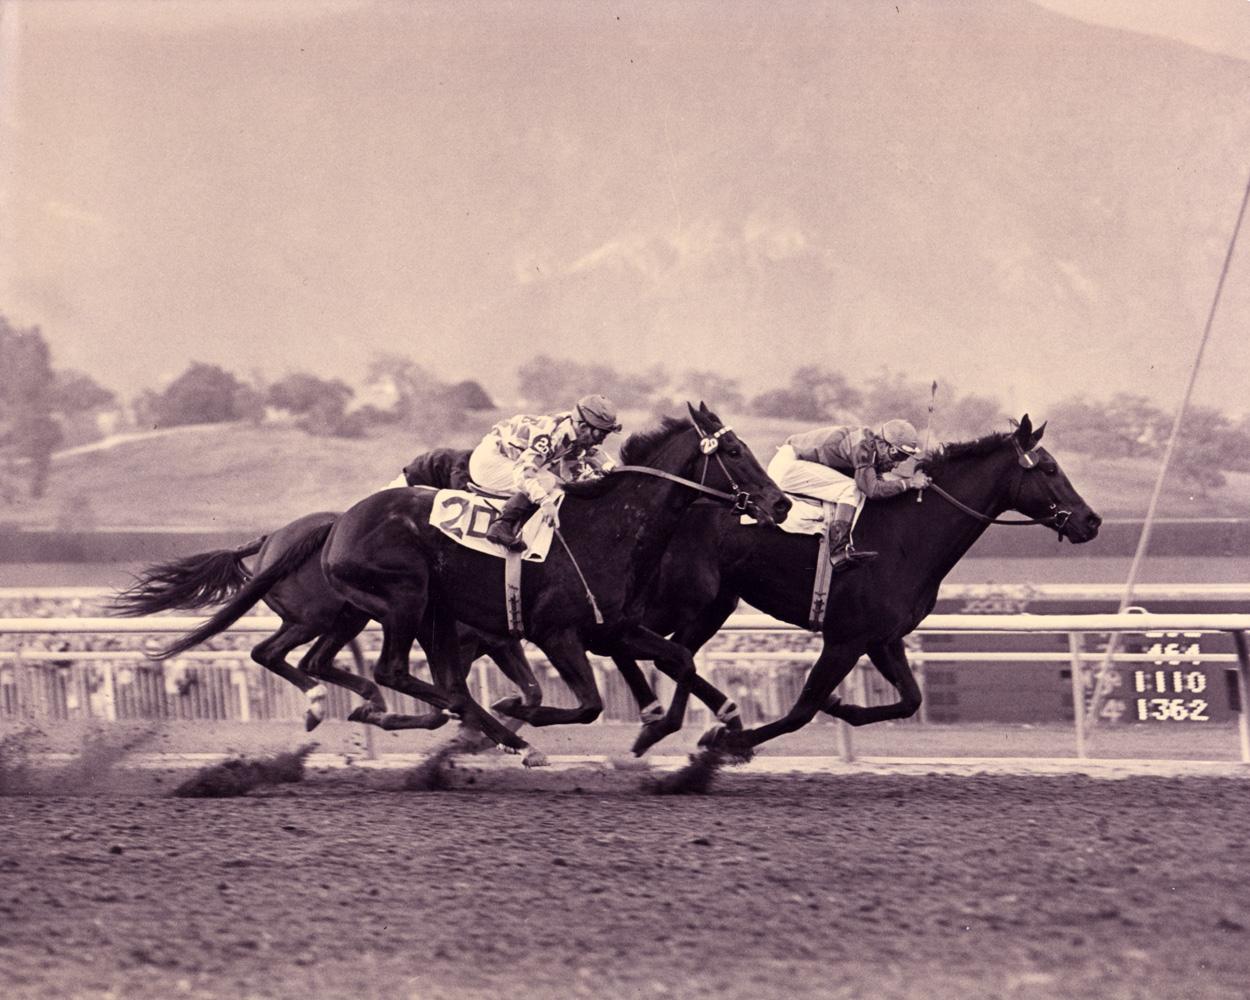 Ralph Neves and Cornhusker winning the 1957 Santa Anita Handicap (Santa Anita Photo/Museum Collection)